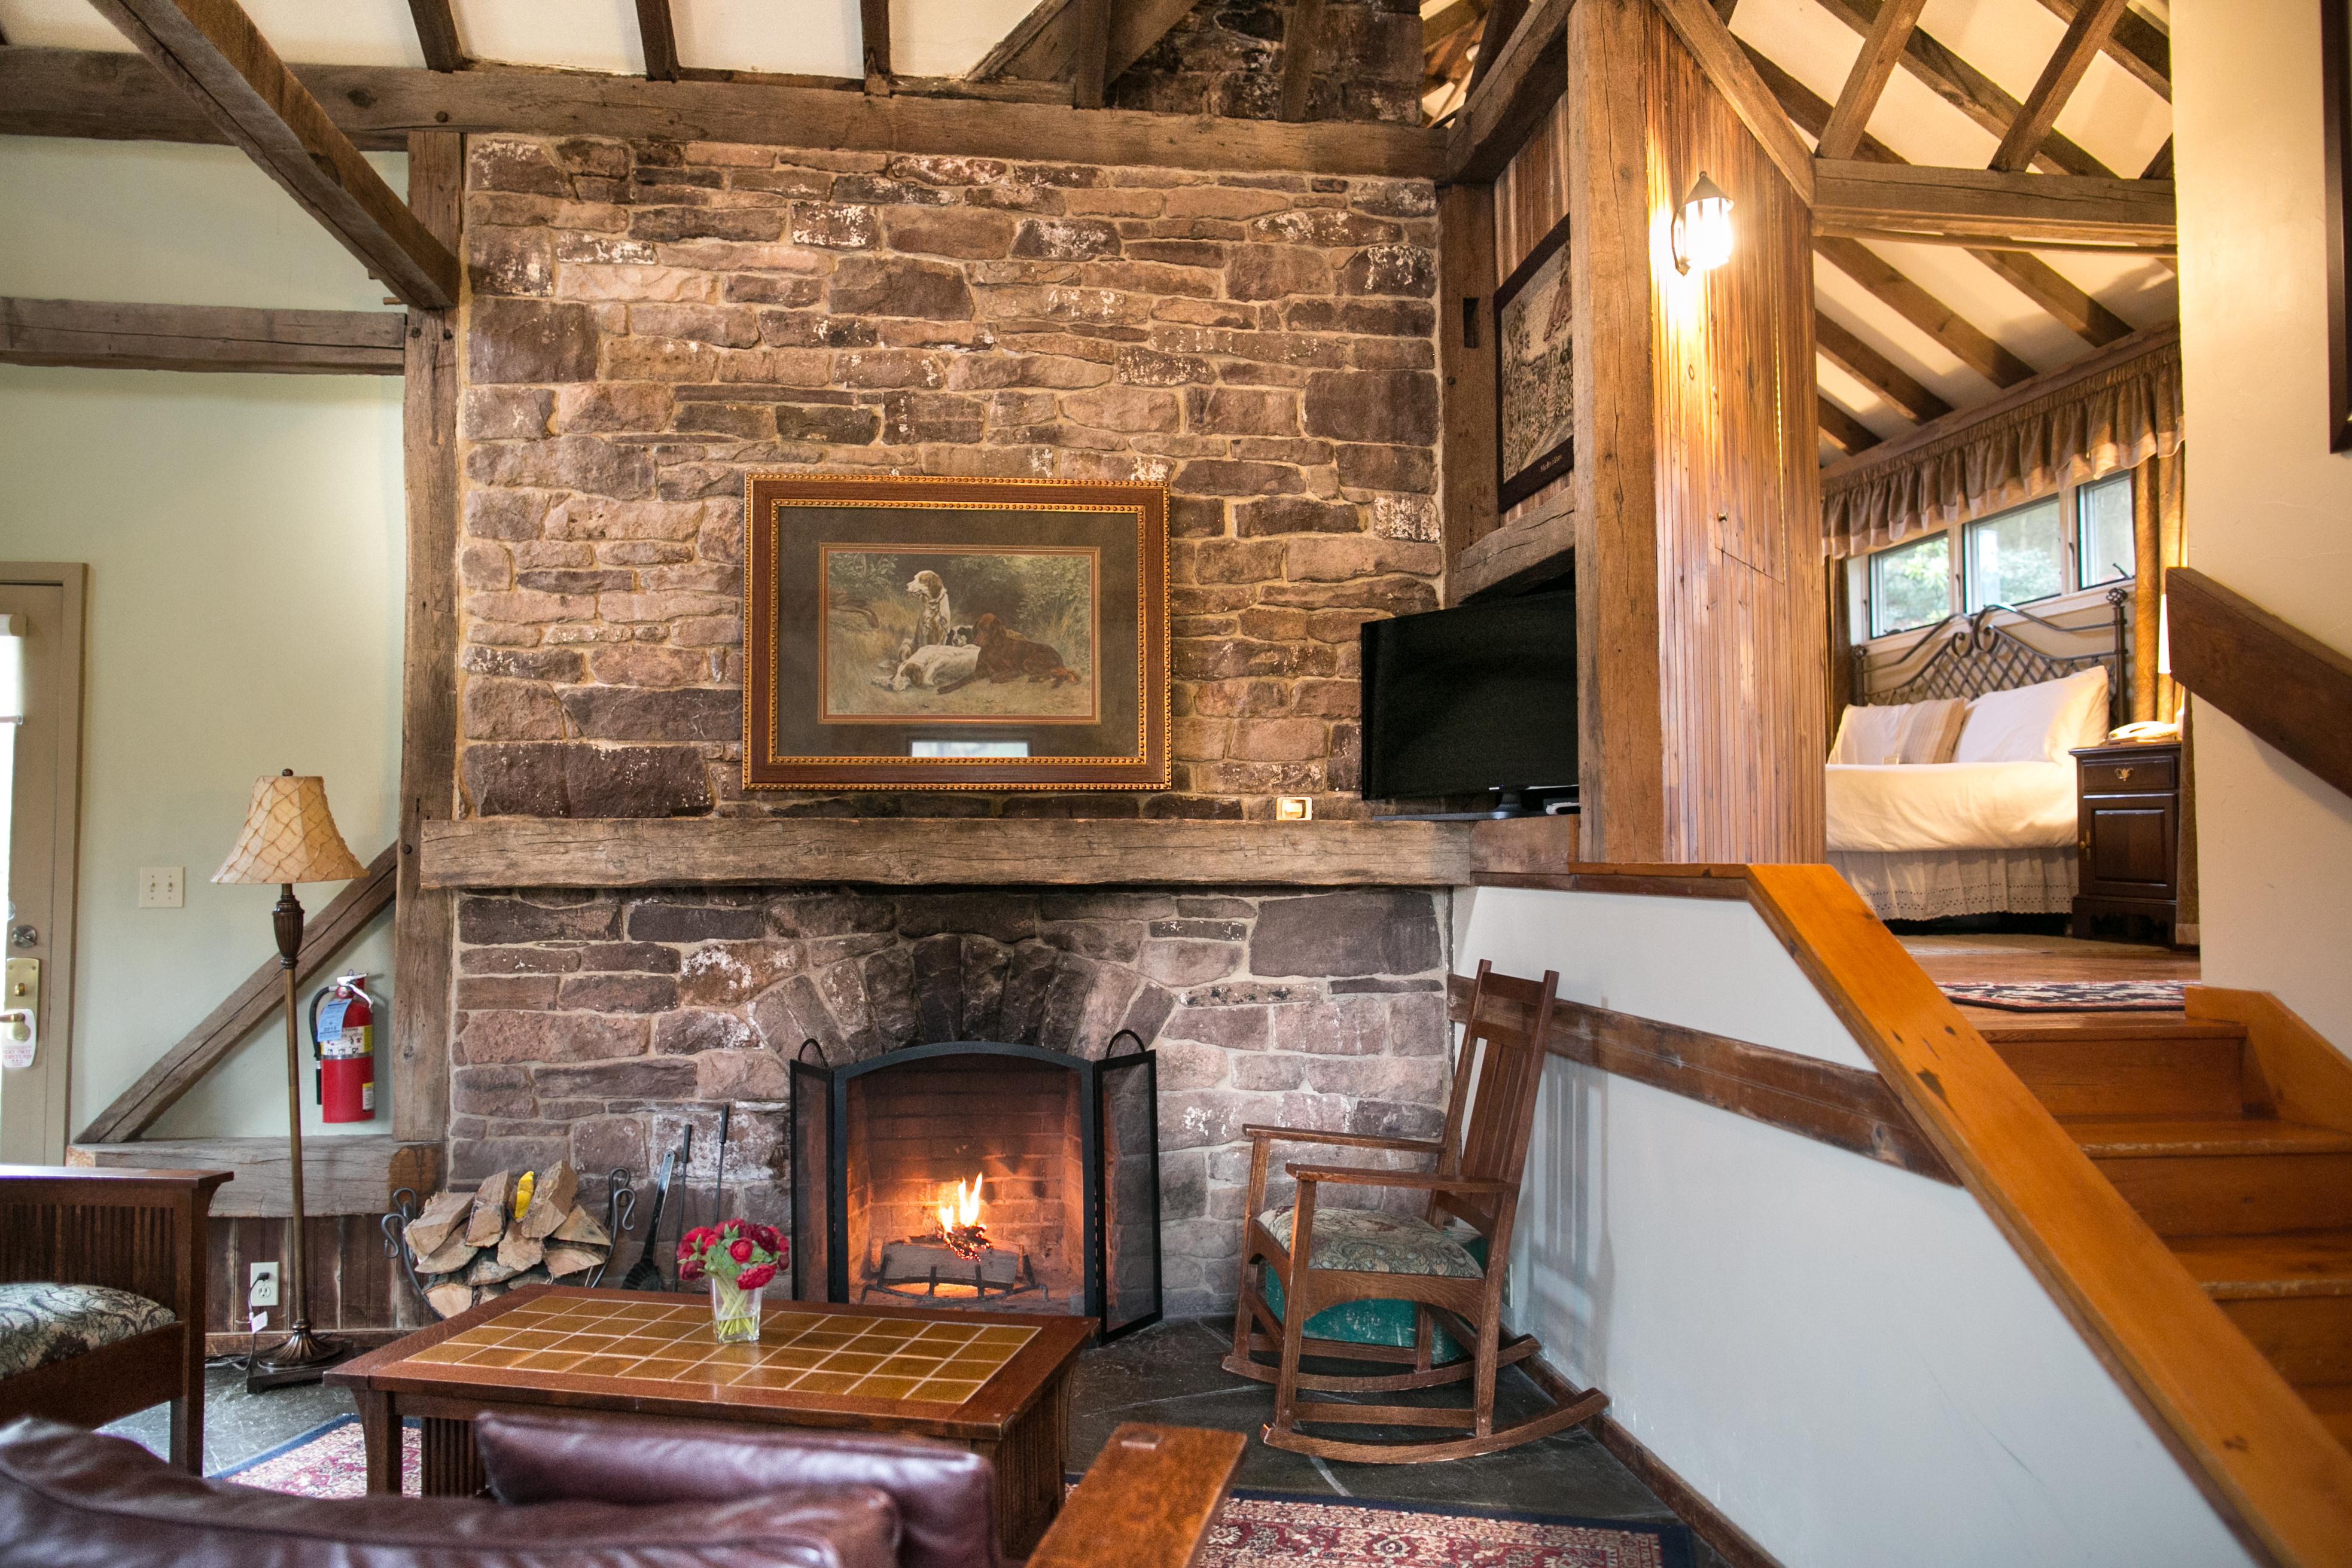 Hotel Rooms & Suites in Lehigh Valley PA | Glasbern Inn